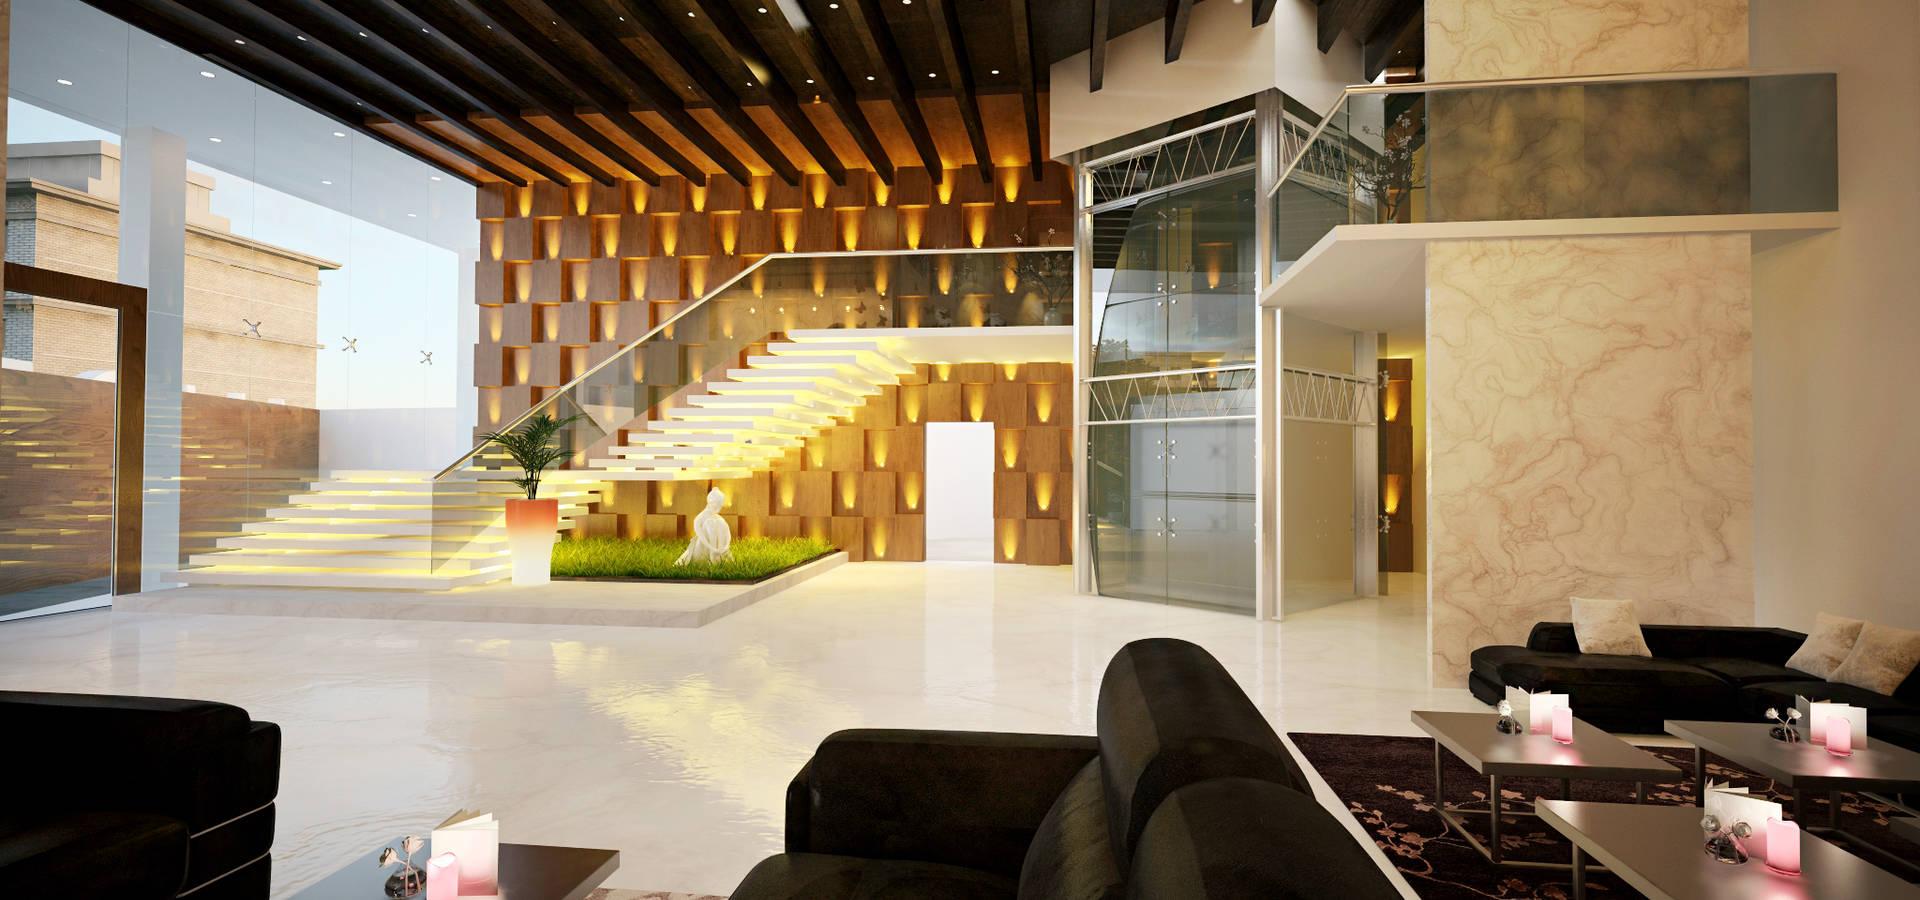 Dexl architect and interior